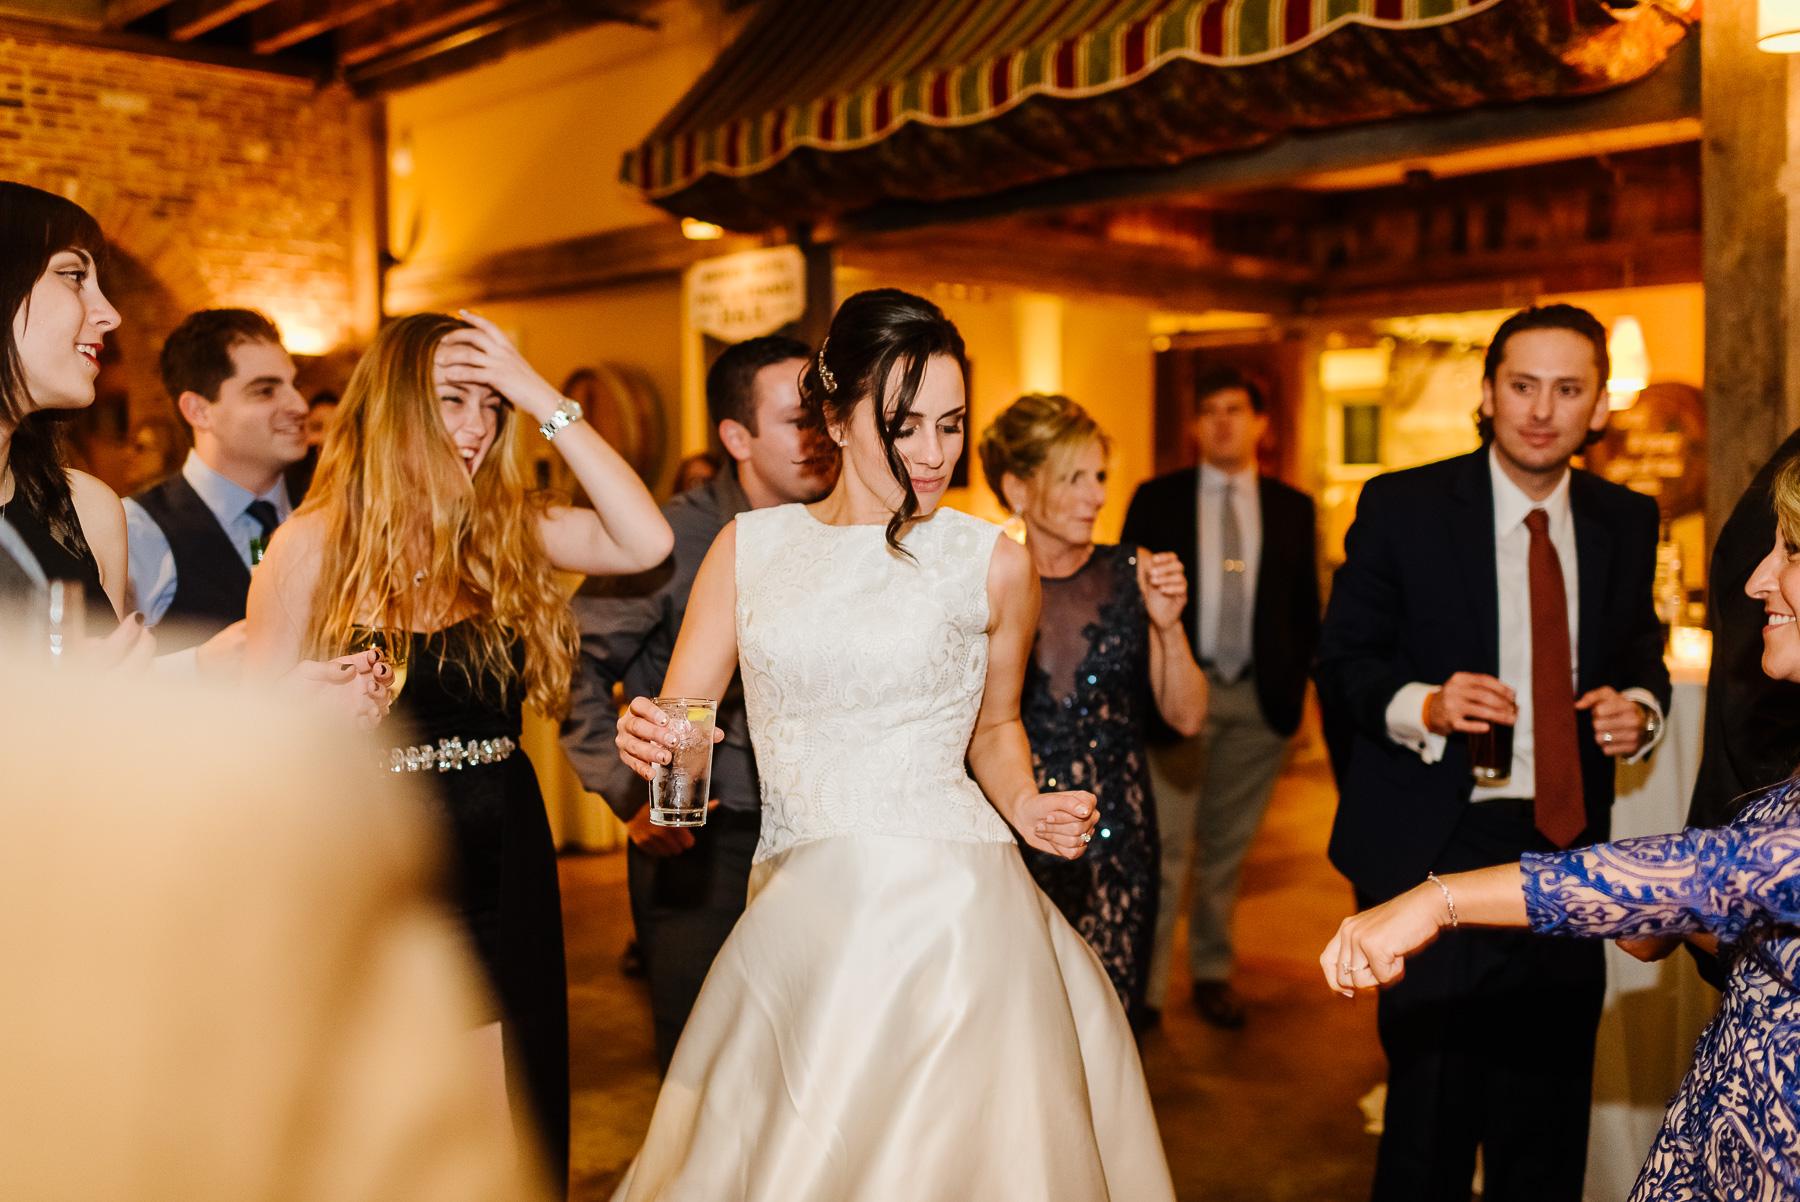 114-Laurita Winery Wedding New Jersey Wedding Photographer Laurita Winery Weddings Longbrook Photography.jpg